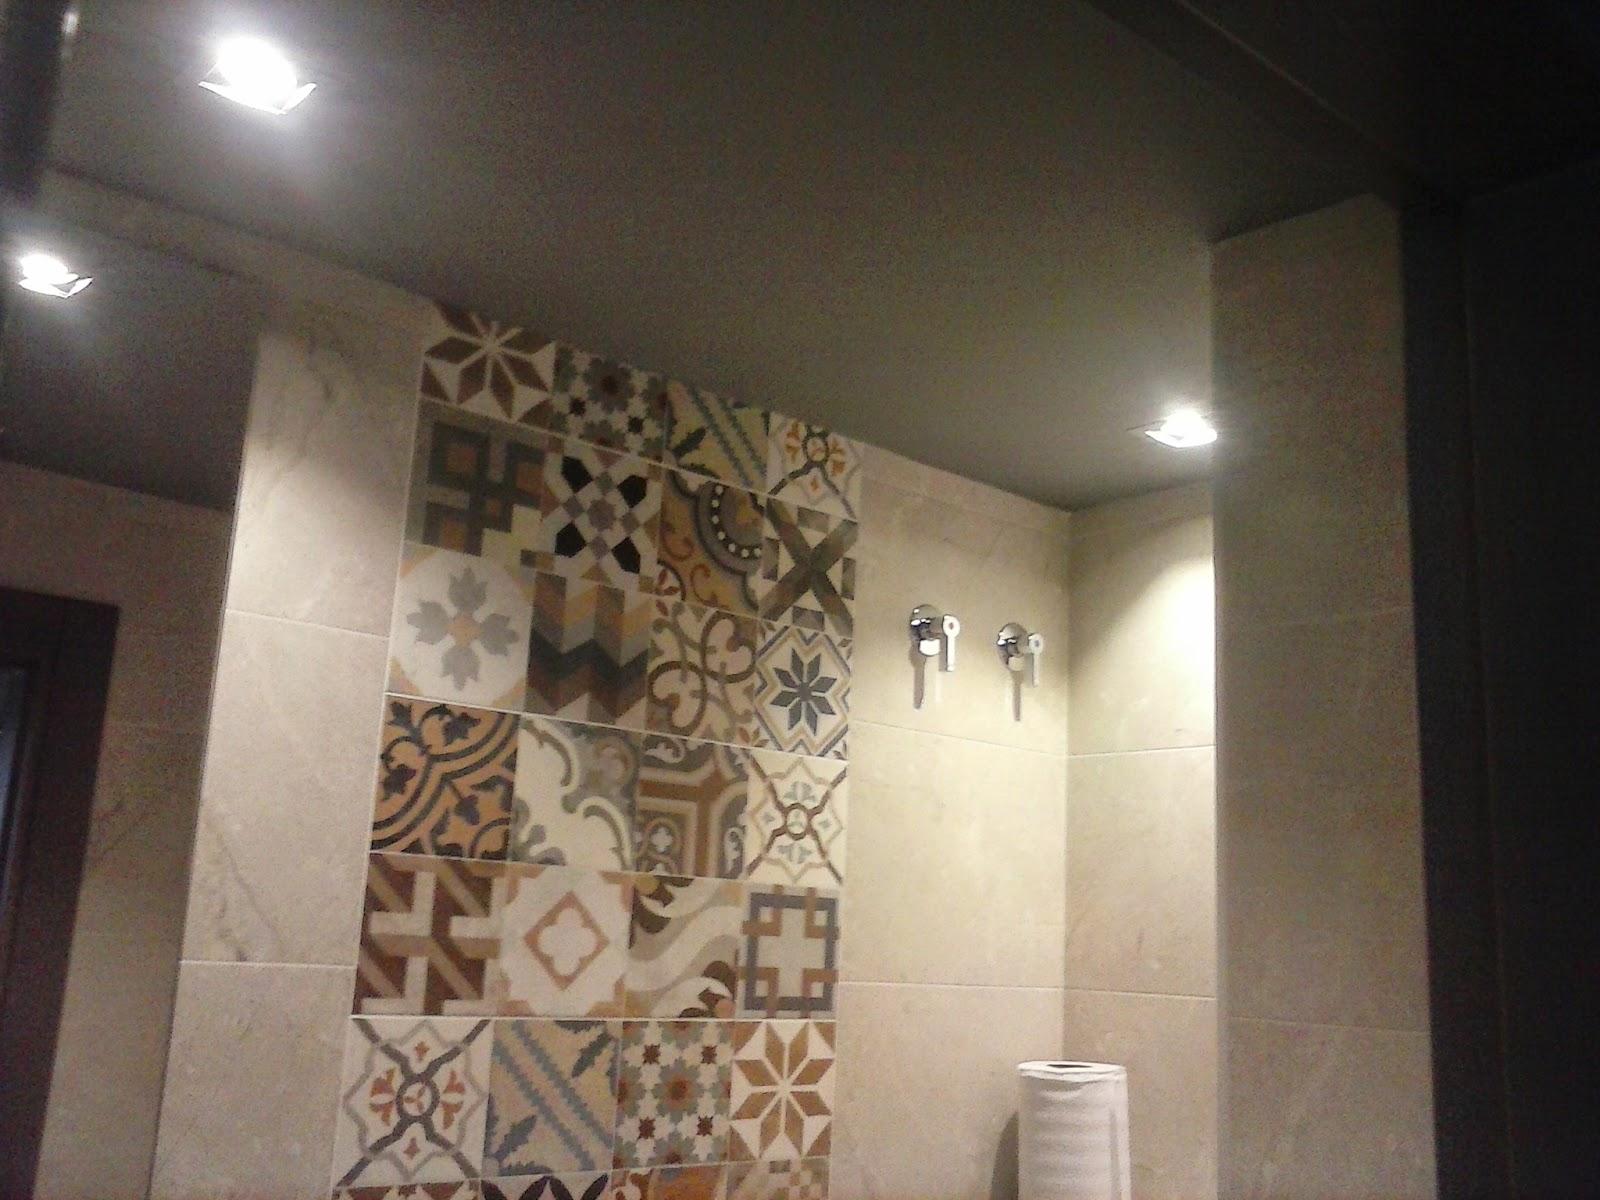 Aislamientos escobar tlf 637849242 bar cafeter a tr bol - Muebles sanchez antequera ...